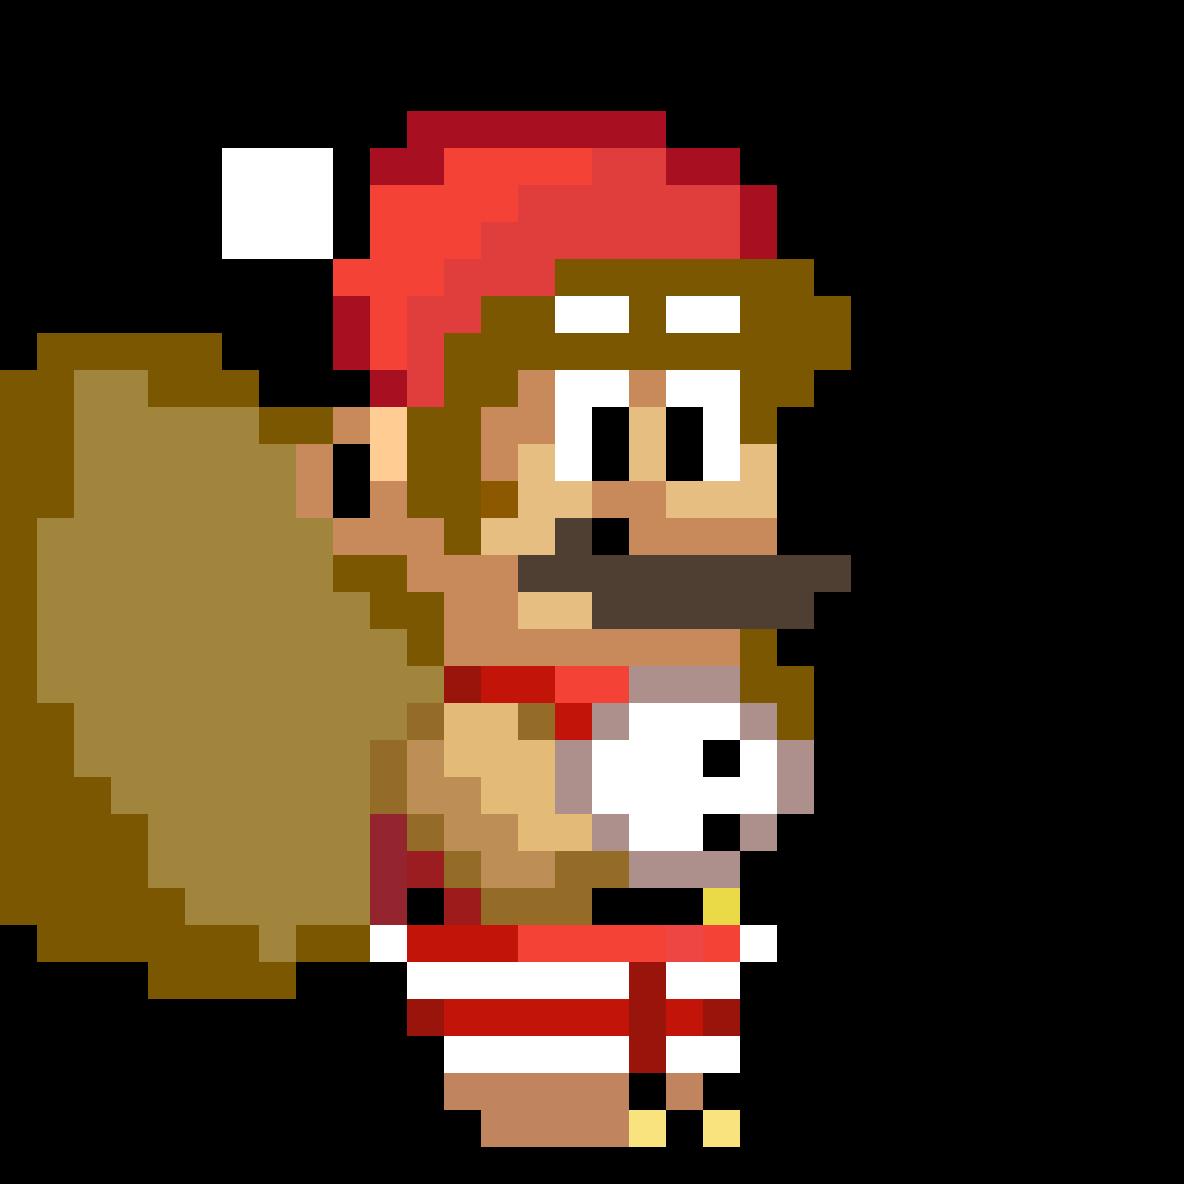 Christmas Mario Png.Pixilart Christmas Mario Custom Emoji By Lazergaming